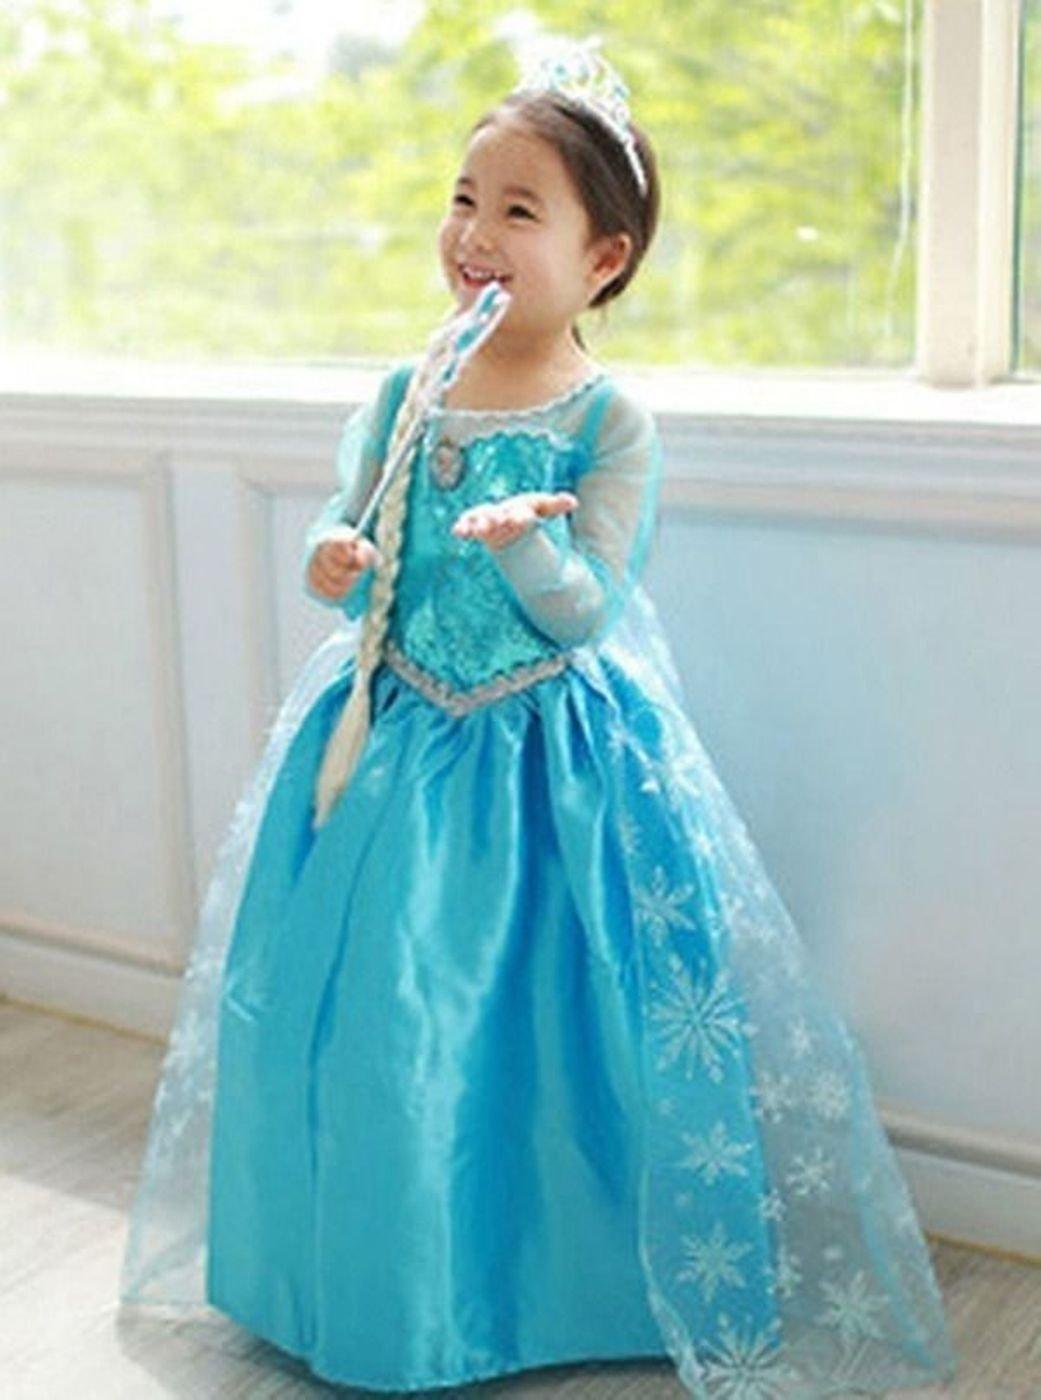 Frozen Elsa Girl Blue Silver Trim Kids Dress Costume *FREE TIARA*  sc 1 st  Lelong.my & Frozen Elsa Girl Blue Silver Trim K (end 5/21/2020 11:05 AM)